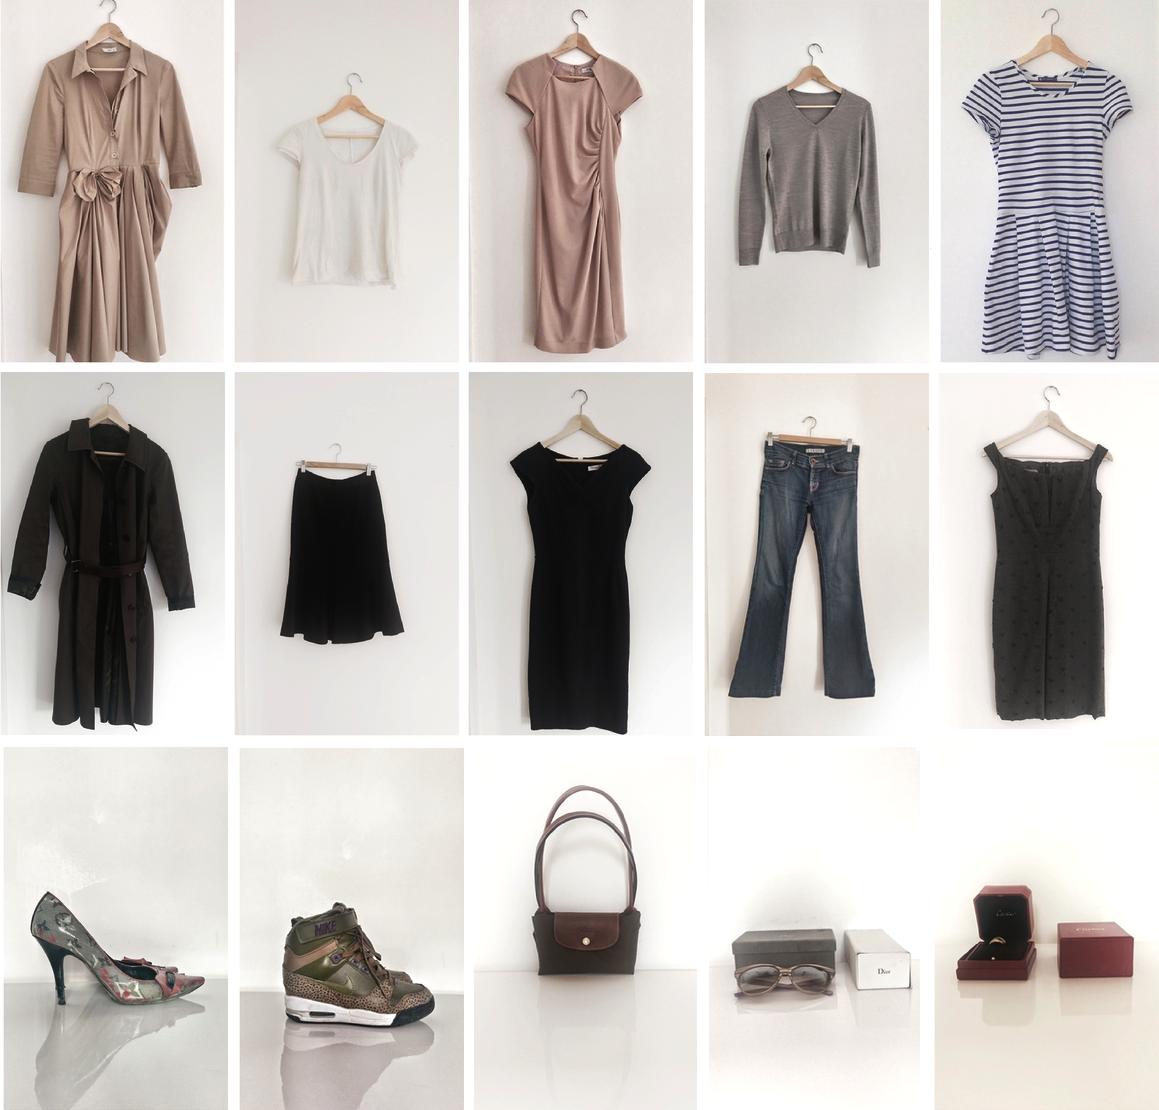 The Benefits Of The 10 Item Wardrobe 10 Piece Wardrobe Minimal Wardrobe And Style